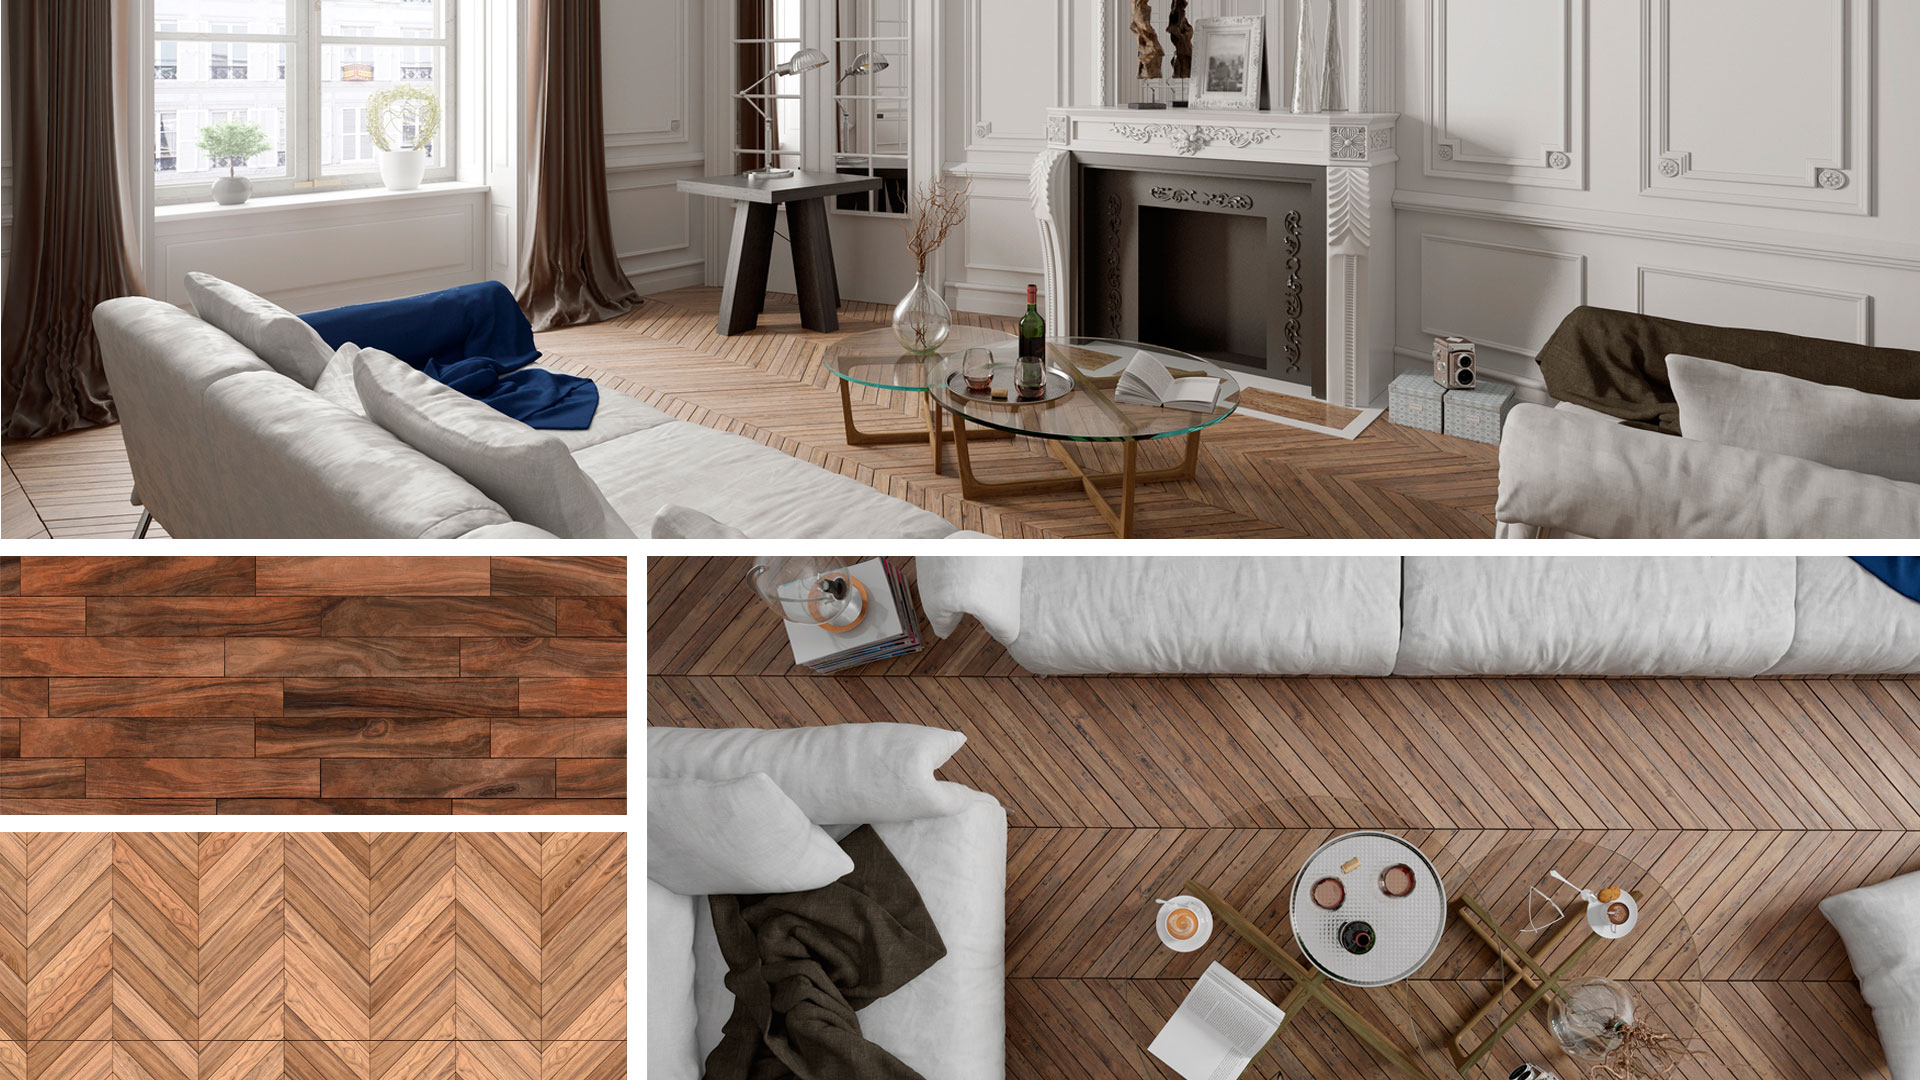 pavimento e pareti in stile parigino